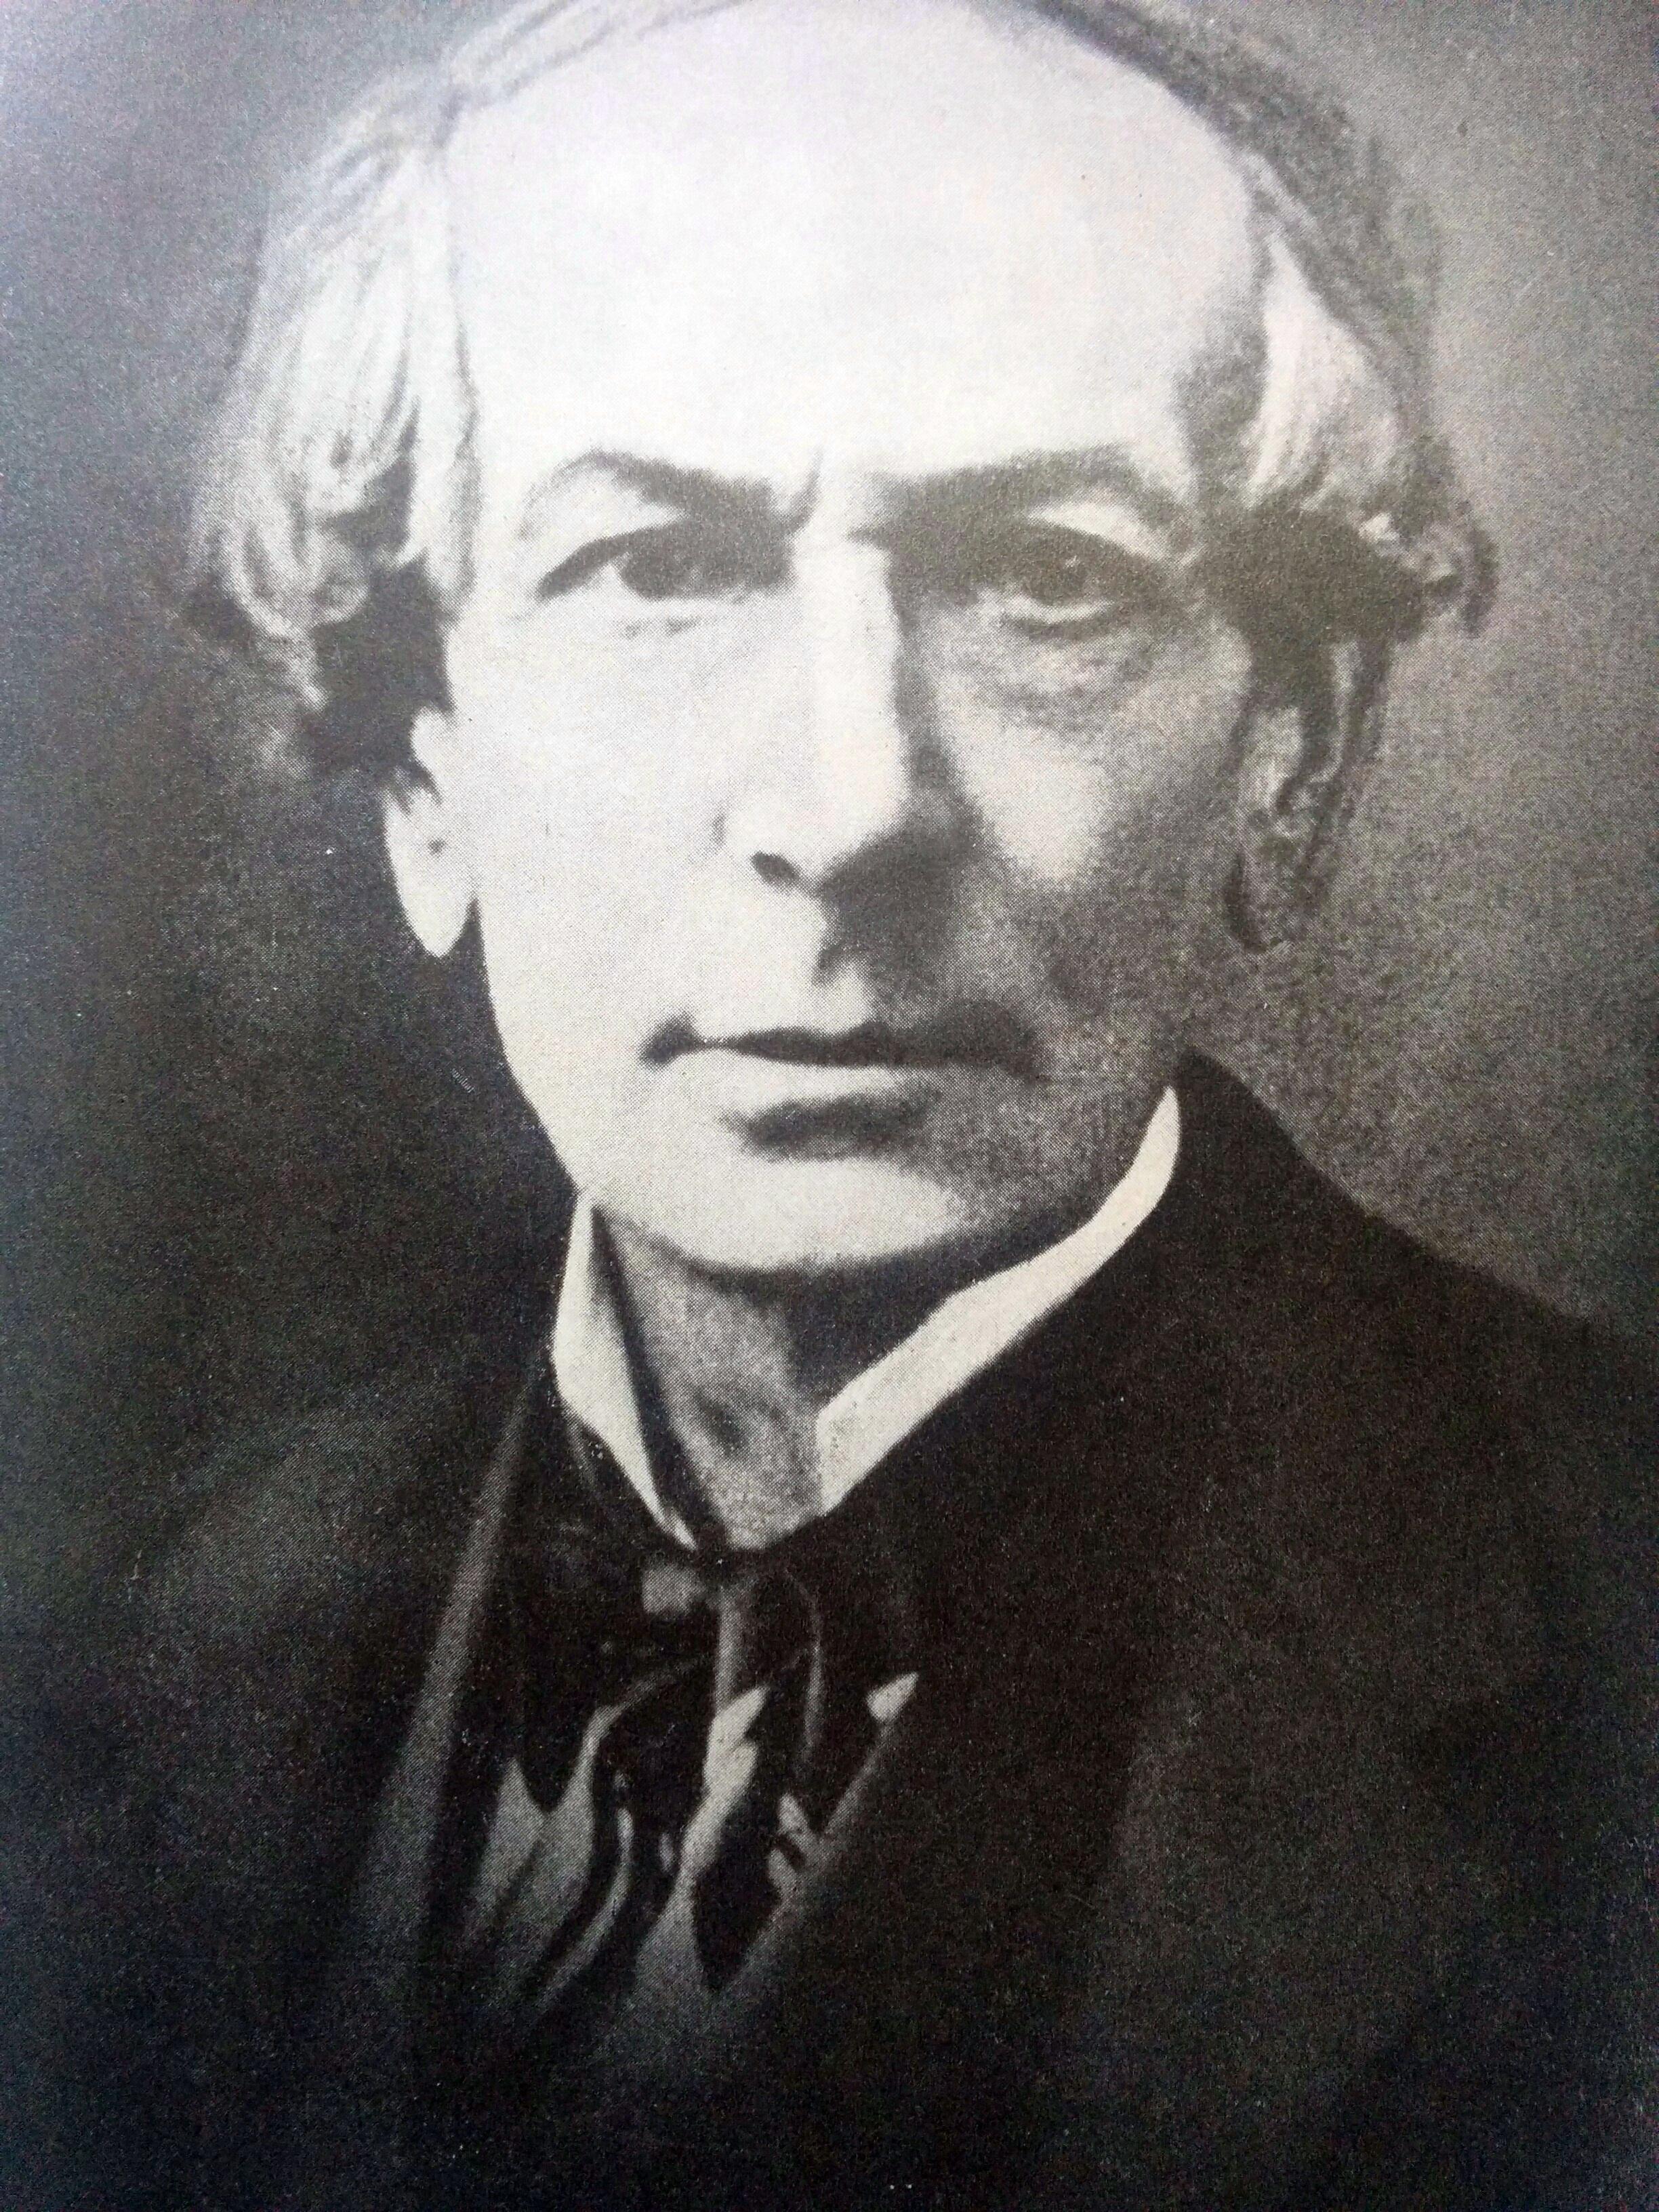 Dr. Juan Bautista Alberdi (1810-1884), padre de la Constitución Nacional, de 1853.